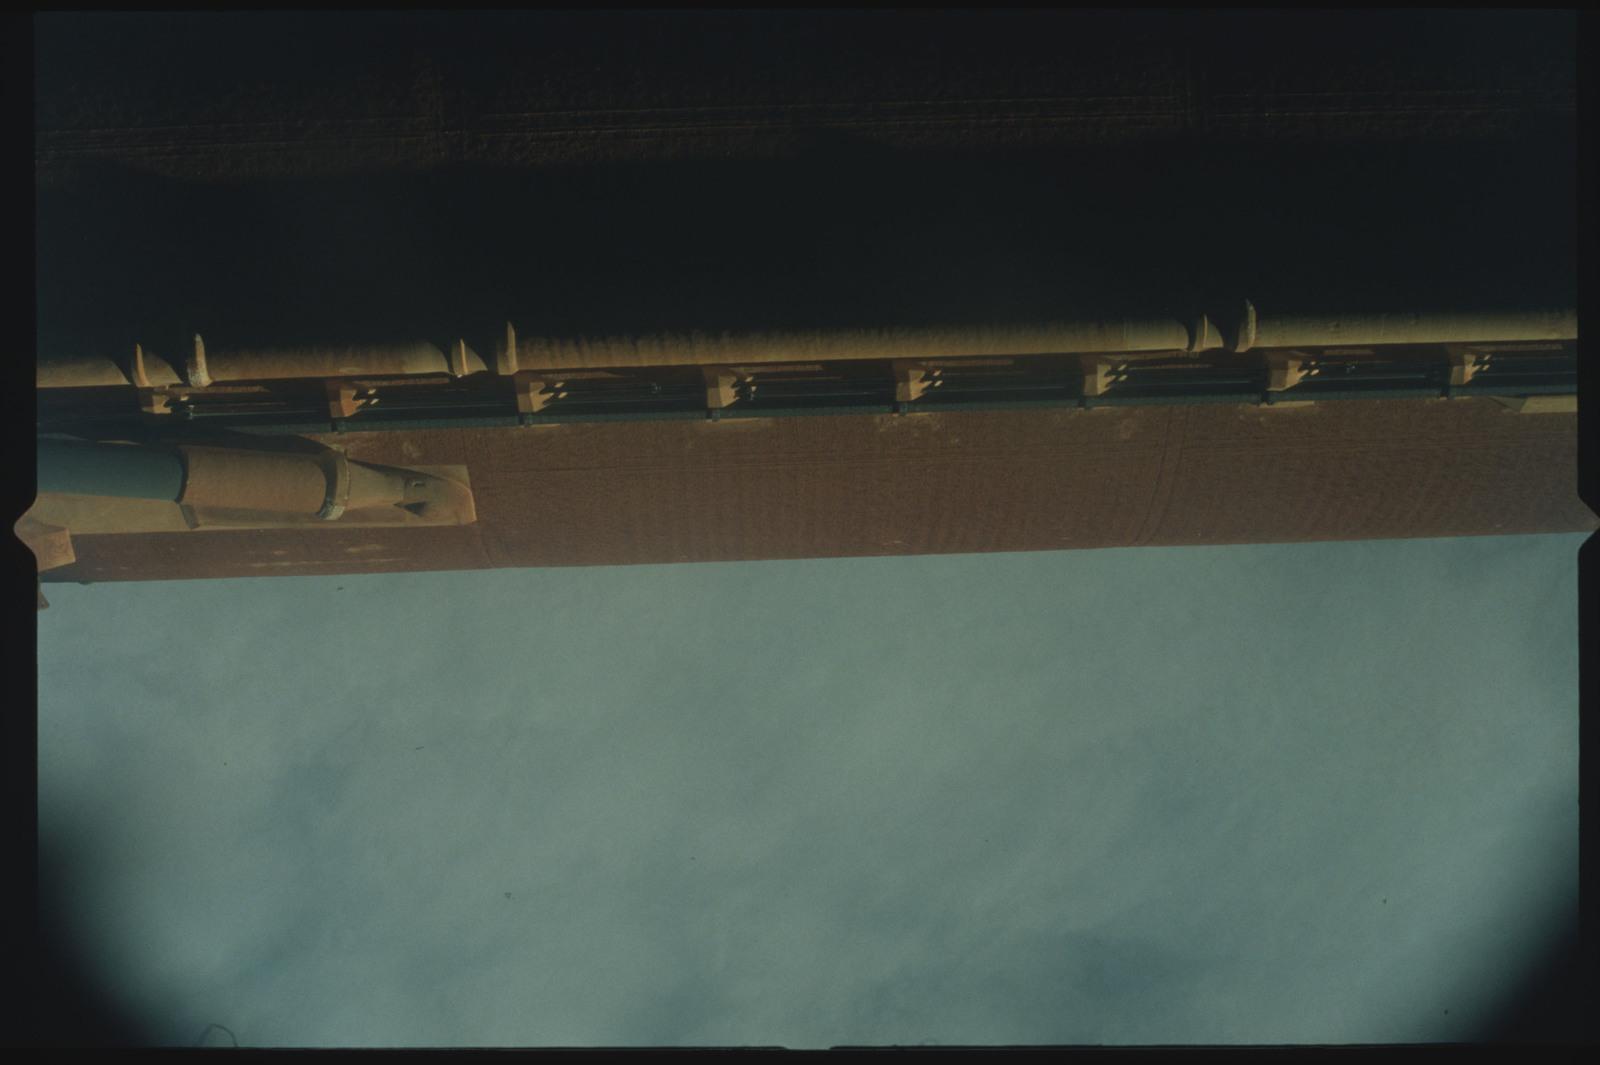 STS096-404-027 - STS-096 - External tanks (ETs) after separation